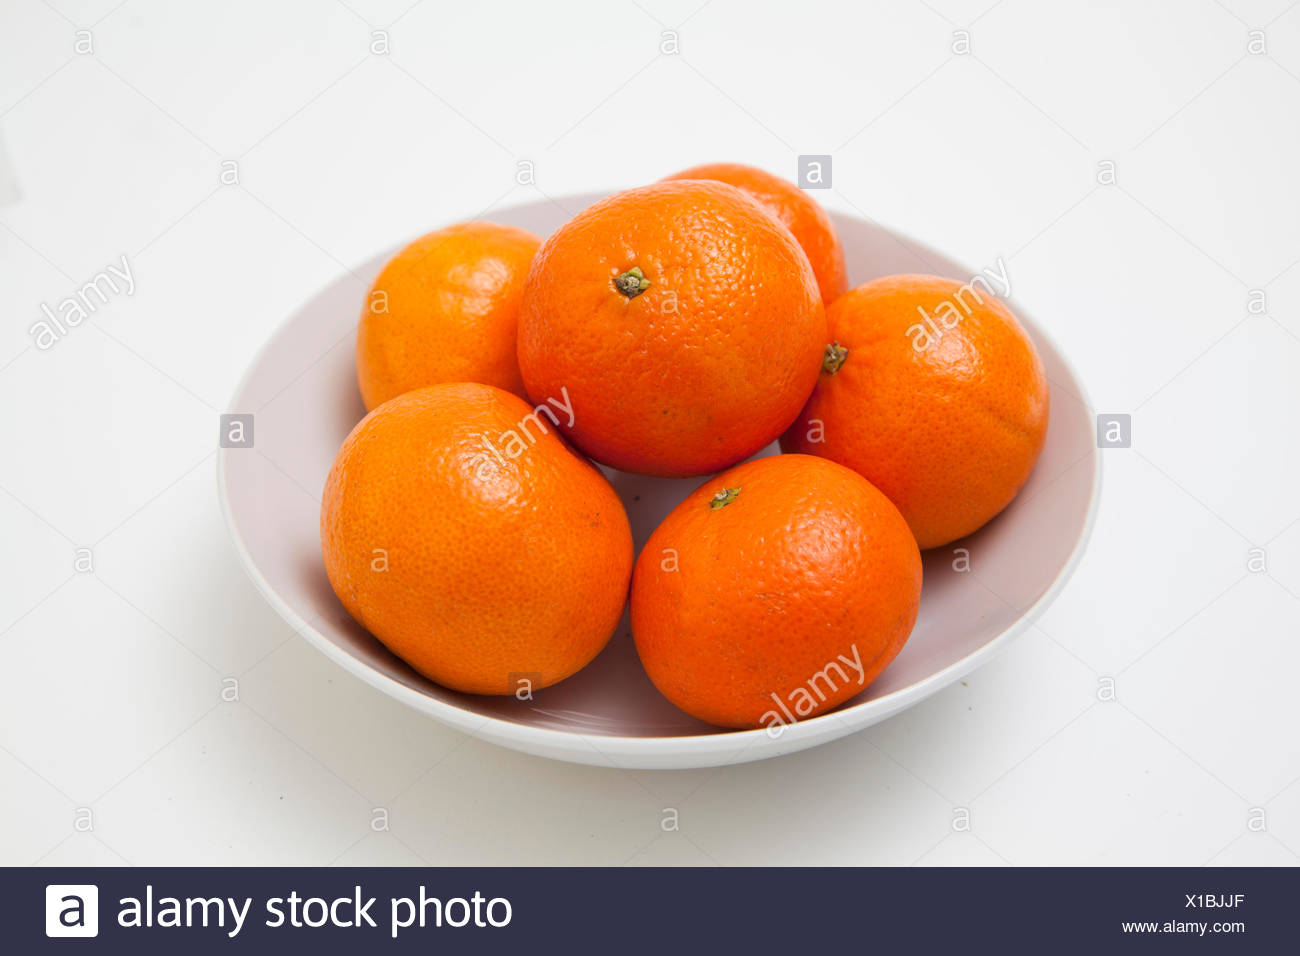 Bowl of oranges - Stock Image